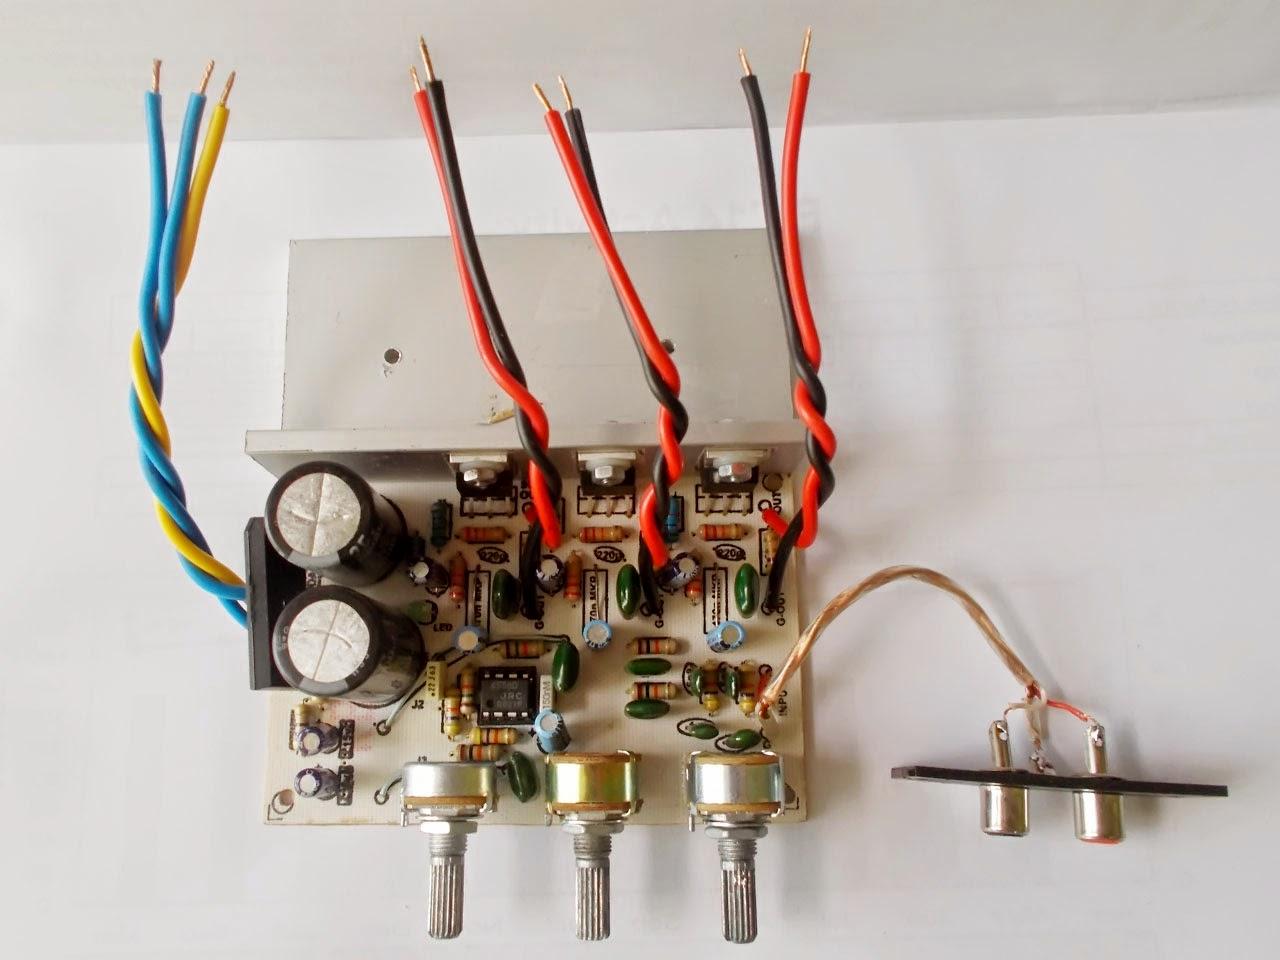 Mengganti jeroan simbadda TDA2030 TDA2050, Oprek simbadda TDA2030 TDA2050, Membuat subwoofer Amplifier TDA2050, Agar Suara Bass Nendang